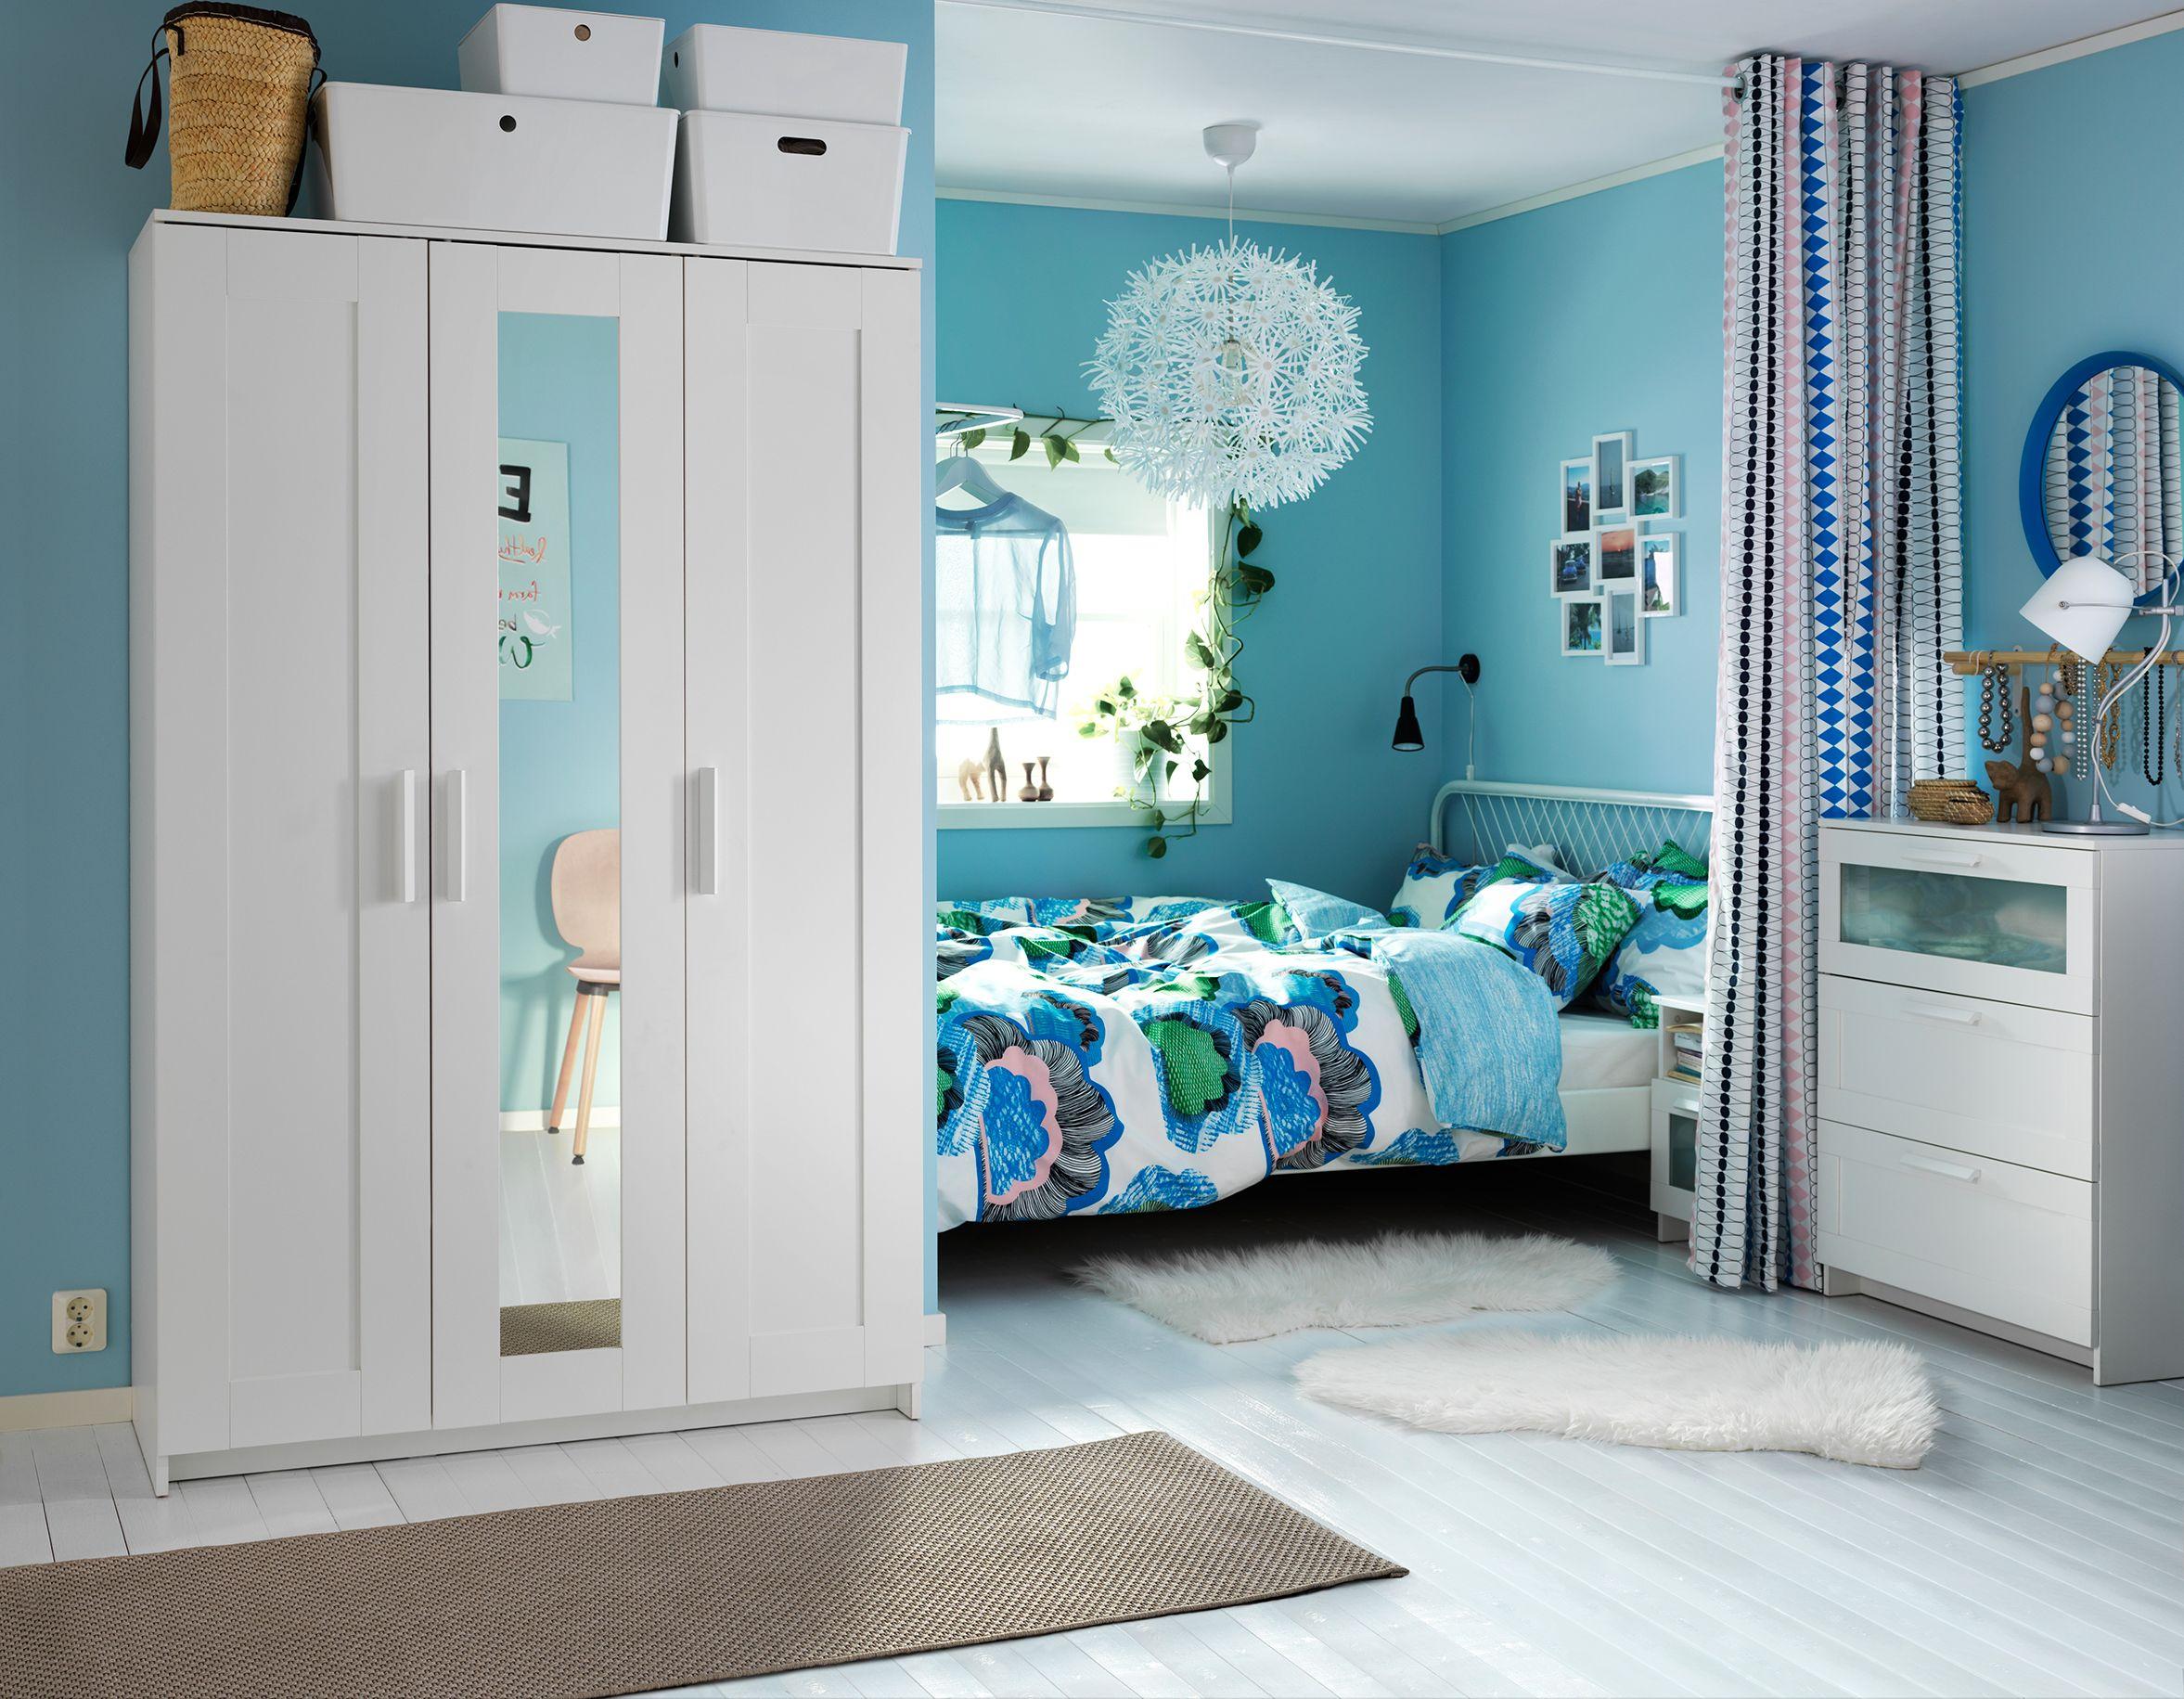 Australia Bedroom furniture inspiration, Small bedroom